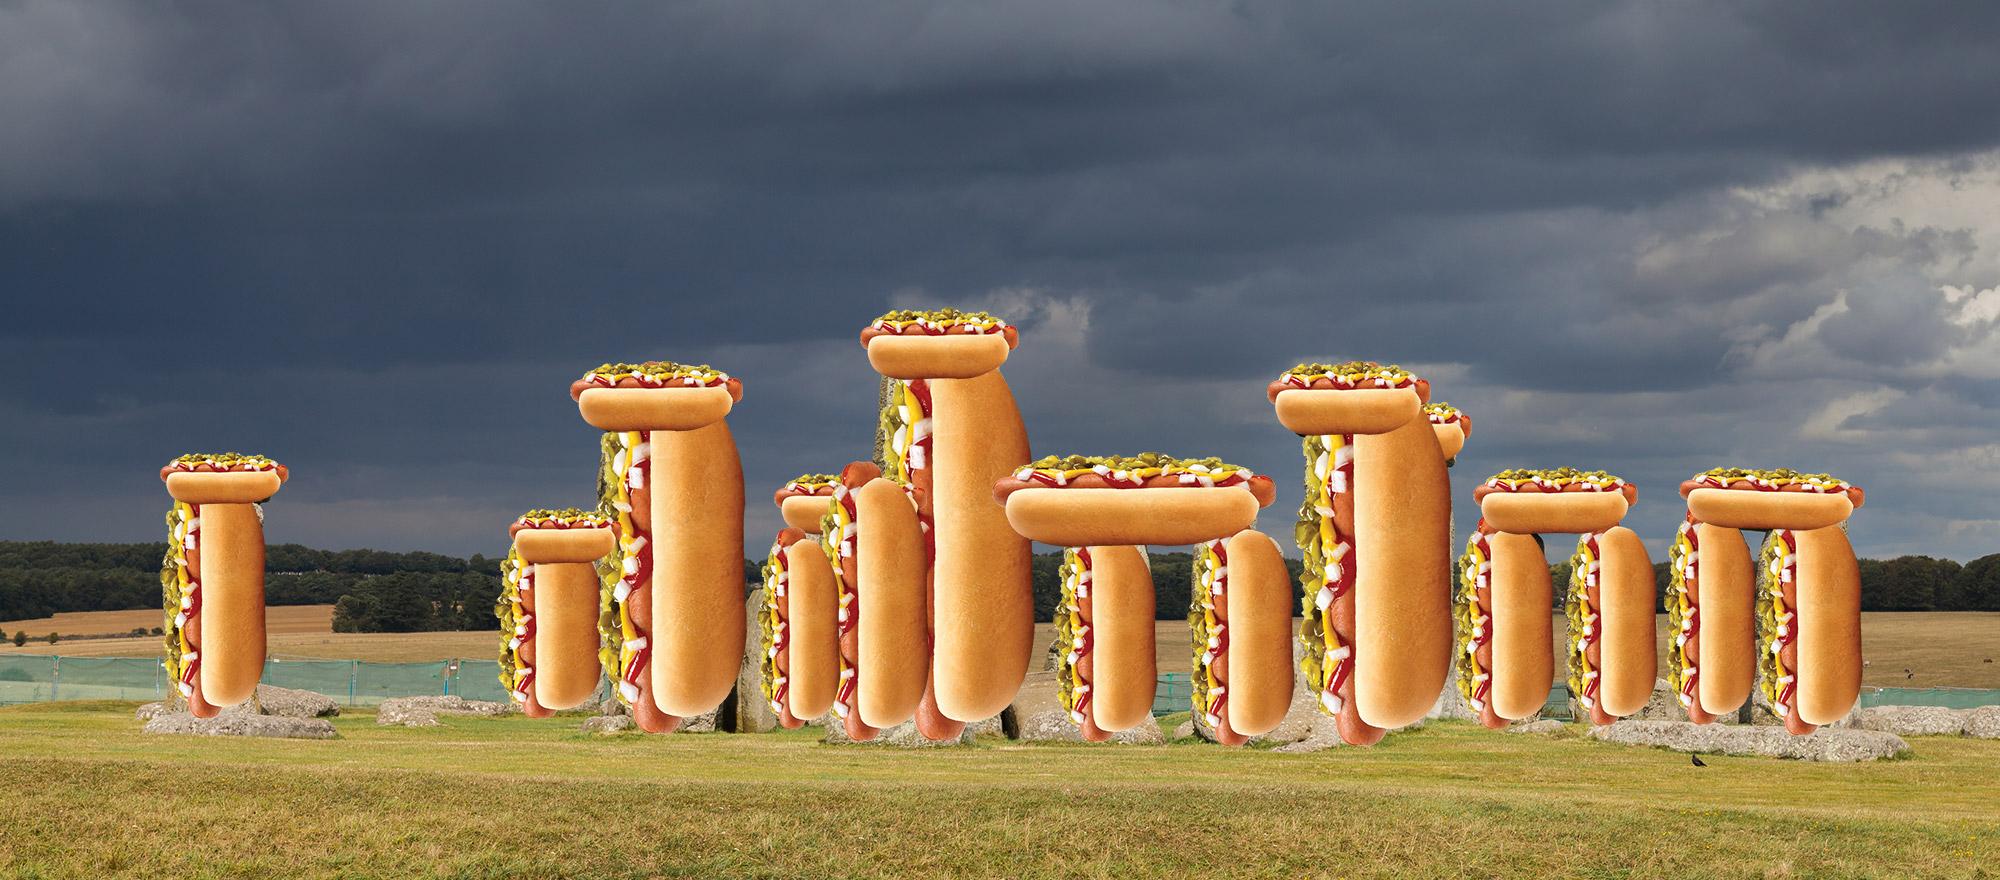 hotdog_henge